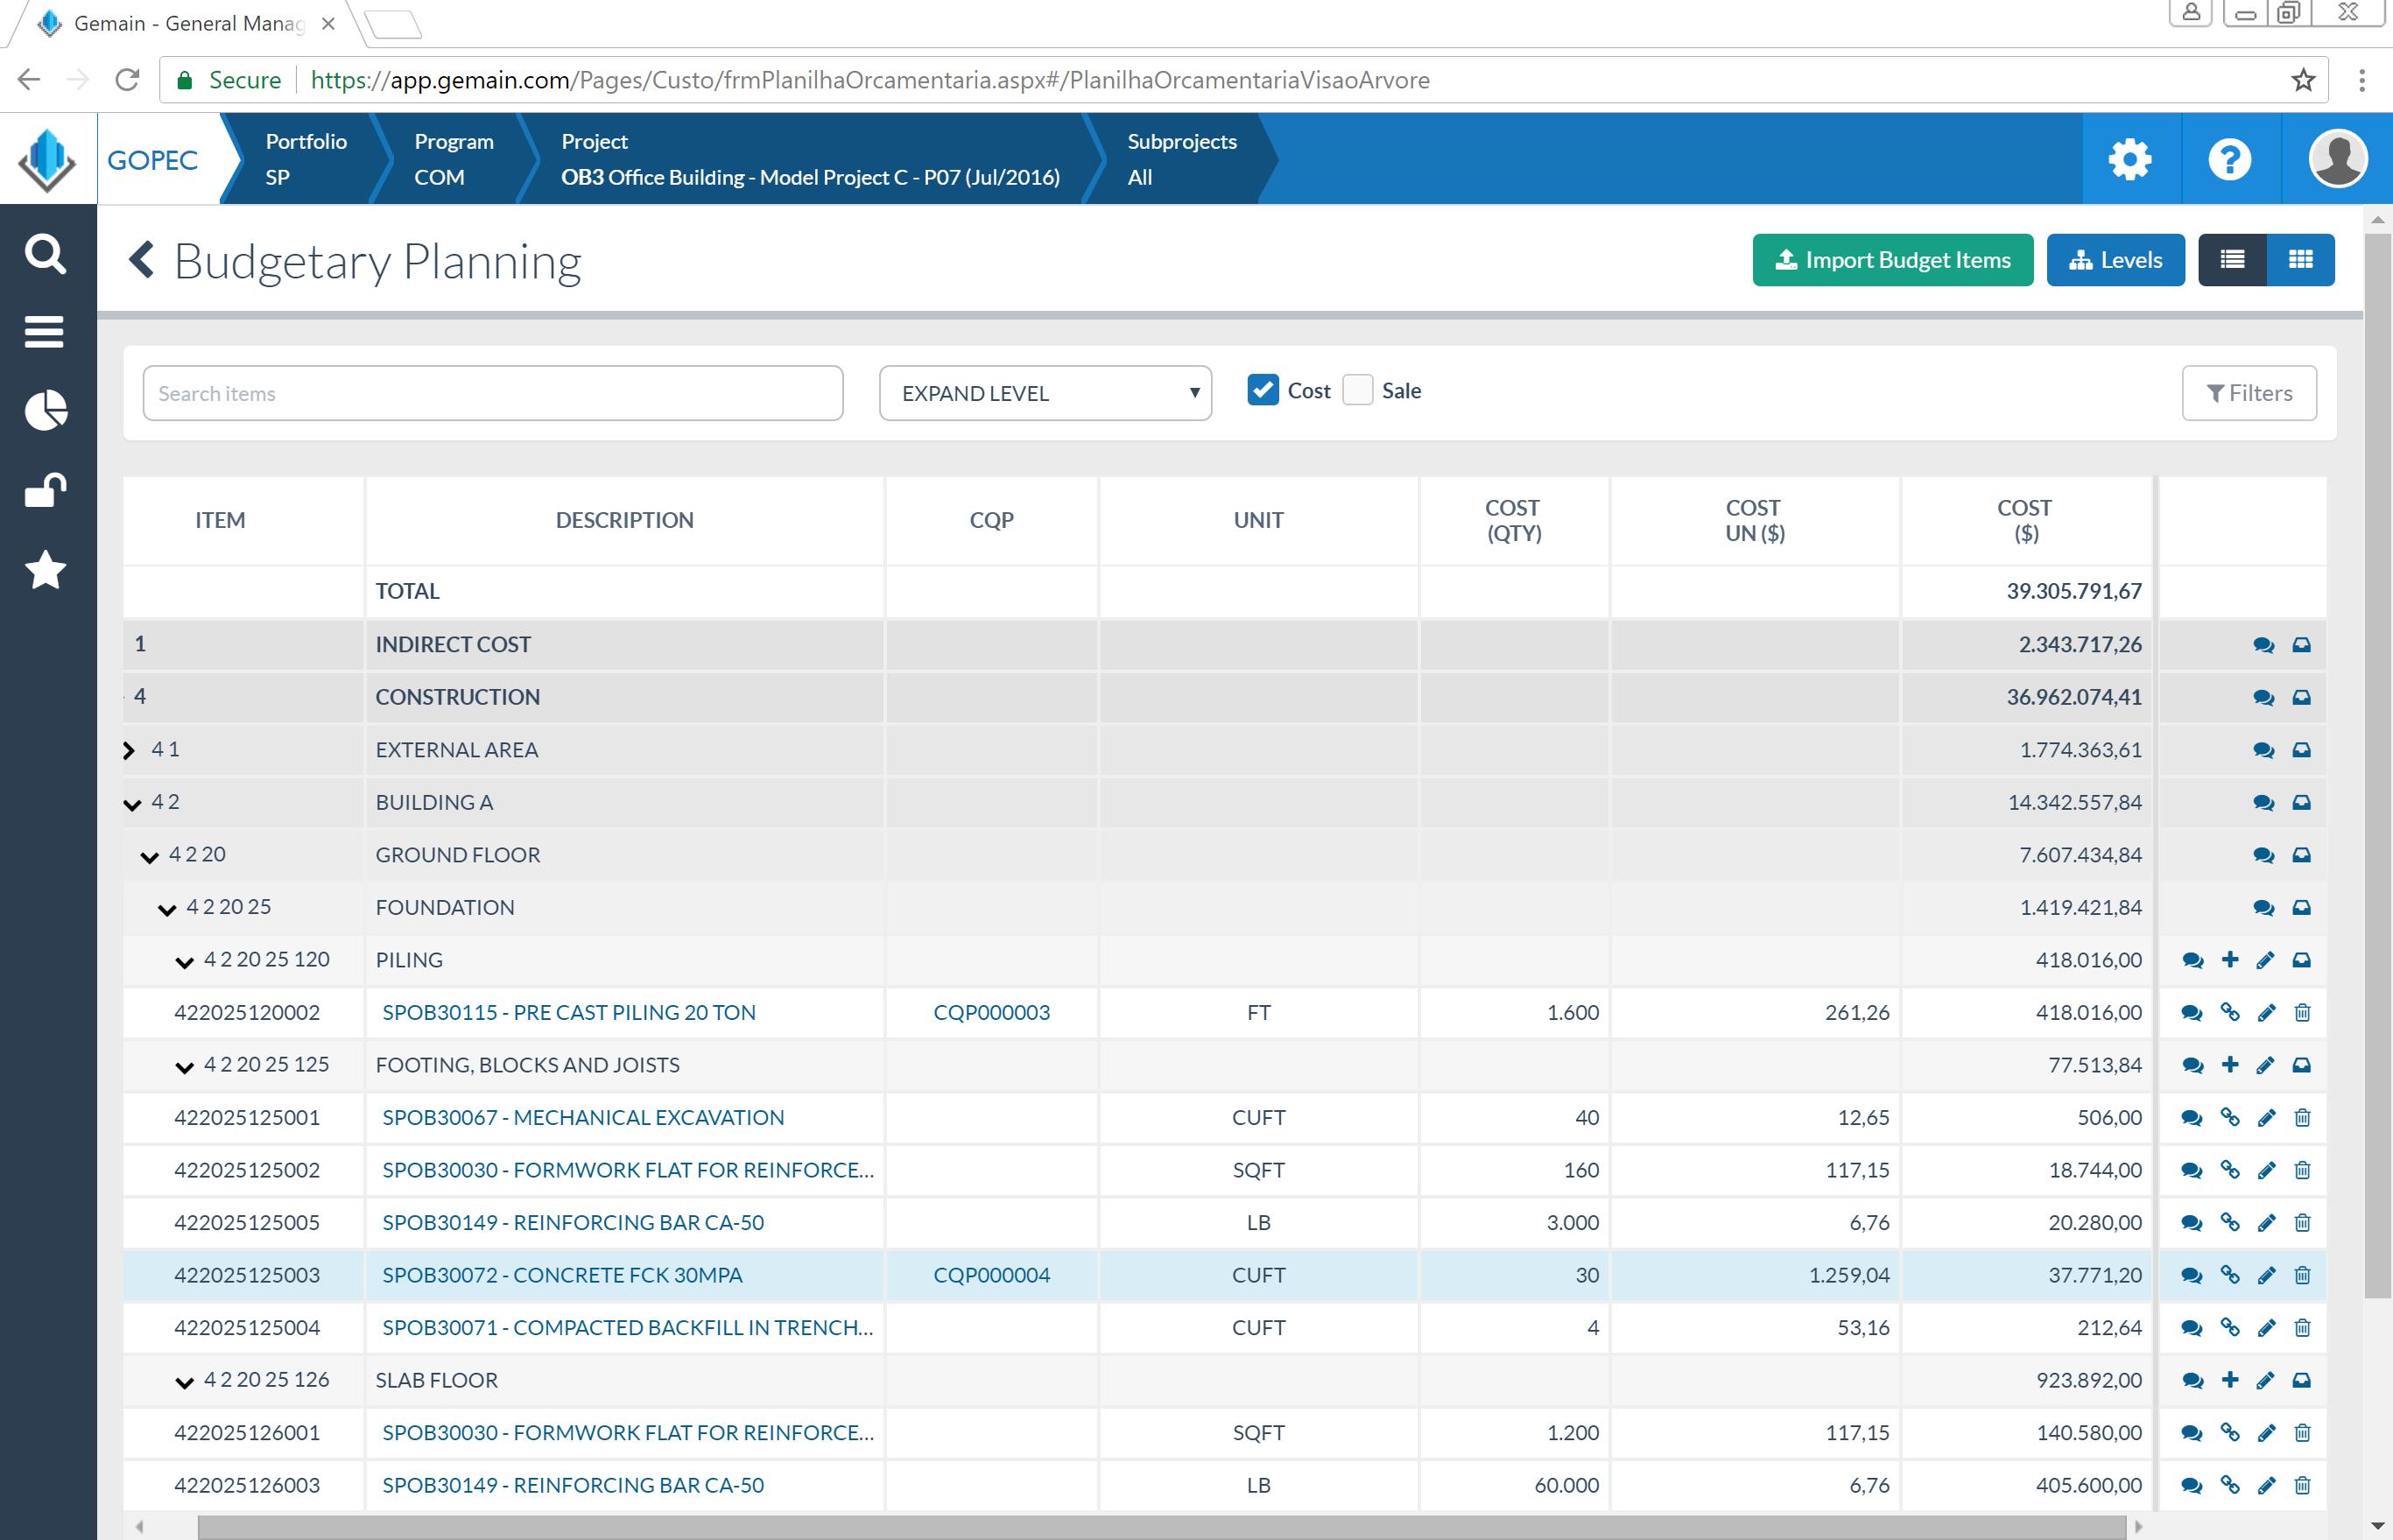 Image 1   budgetary planning screen